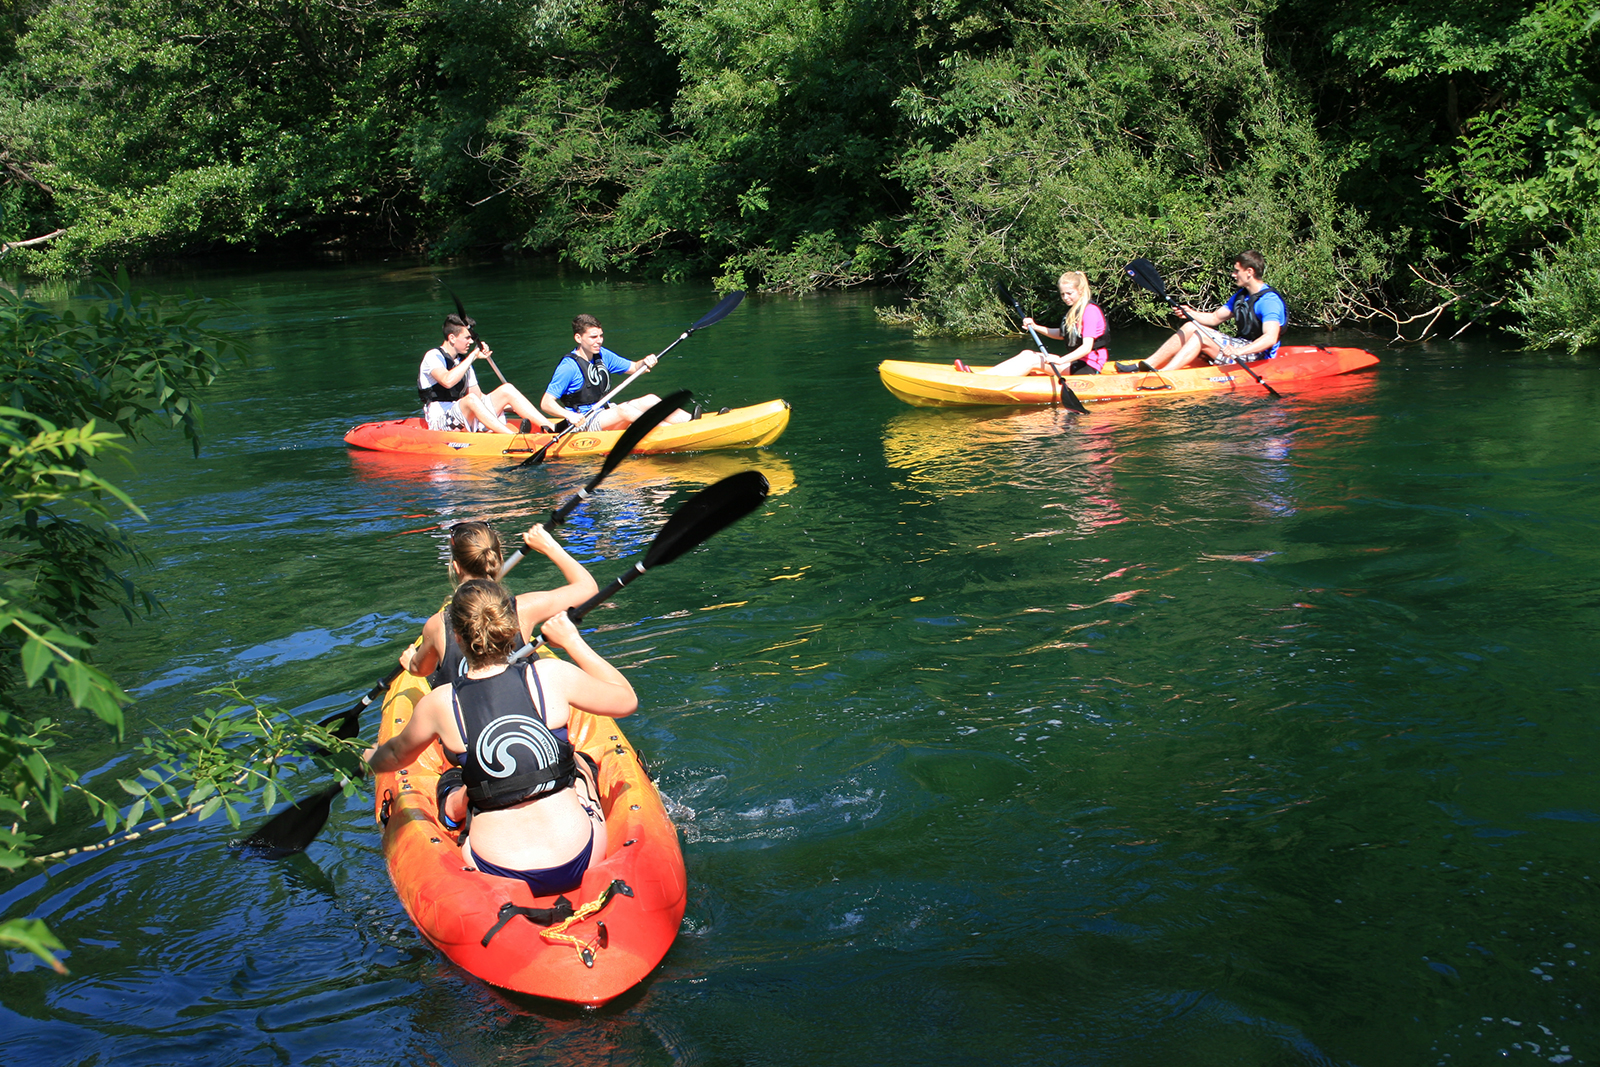 Introduction to Recreational Kayaking - Section III